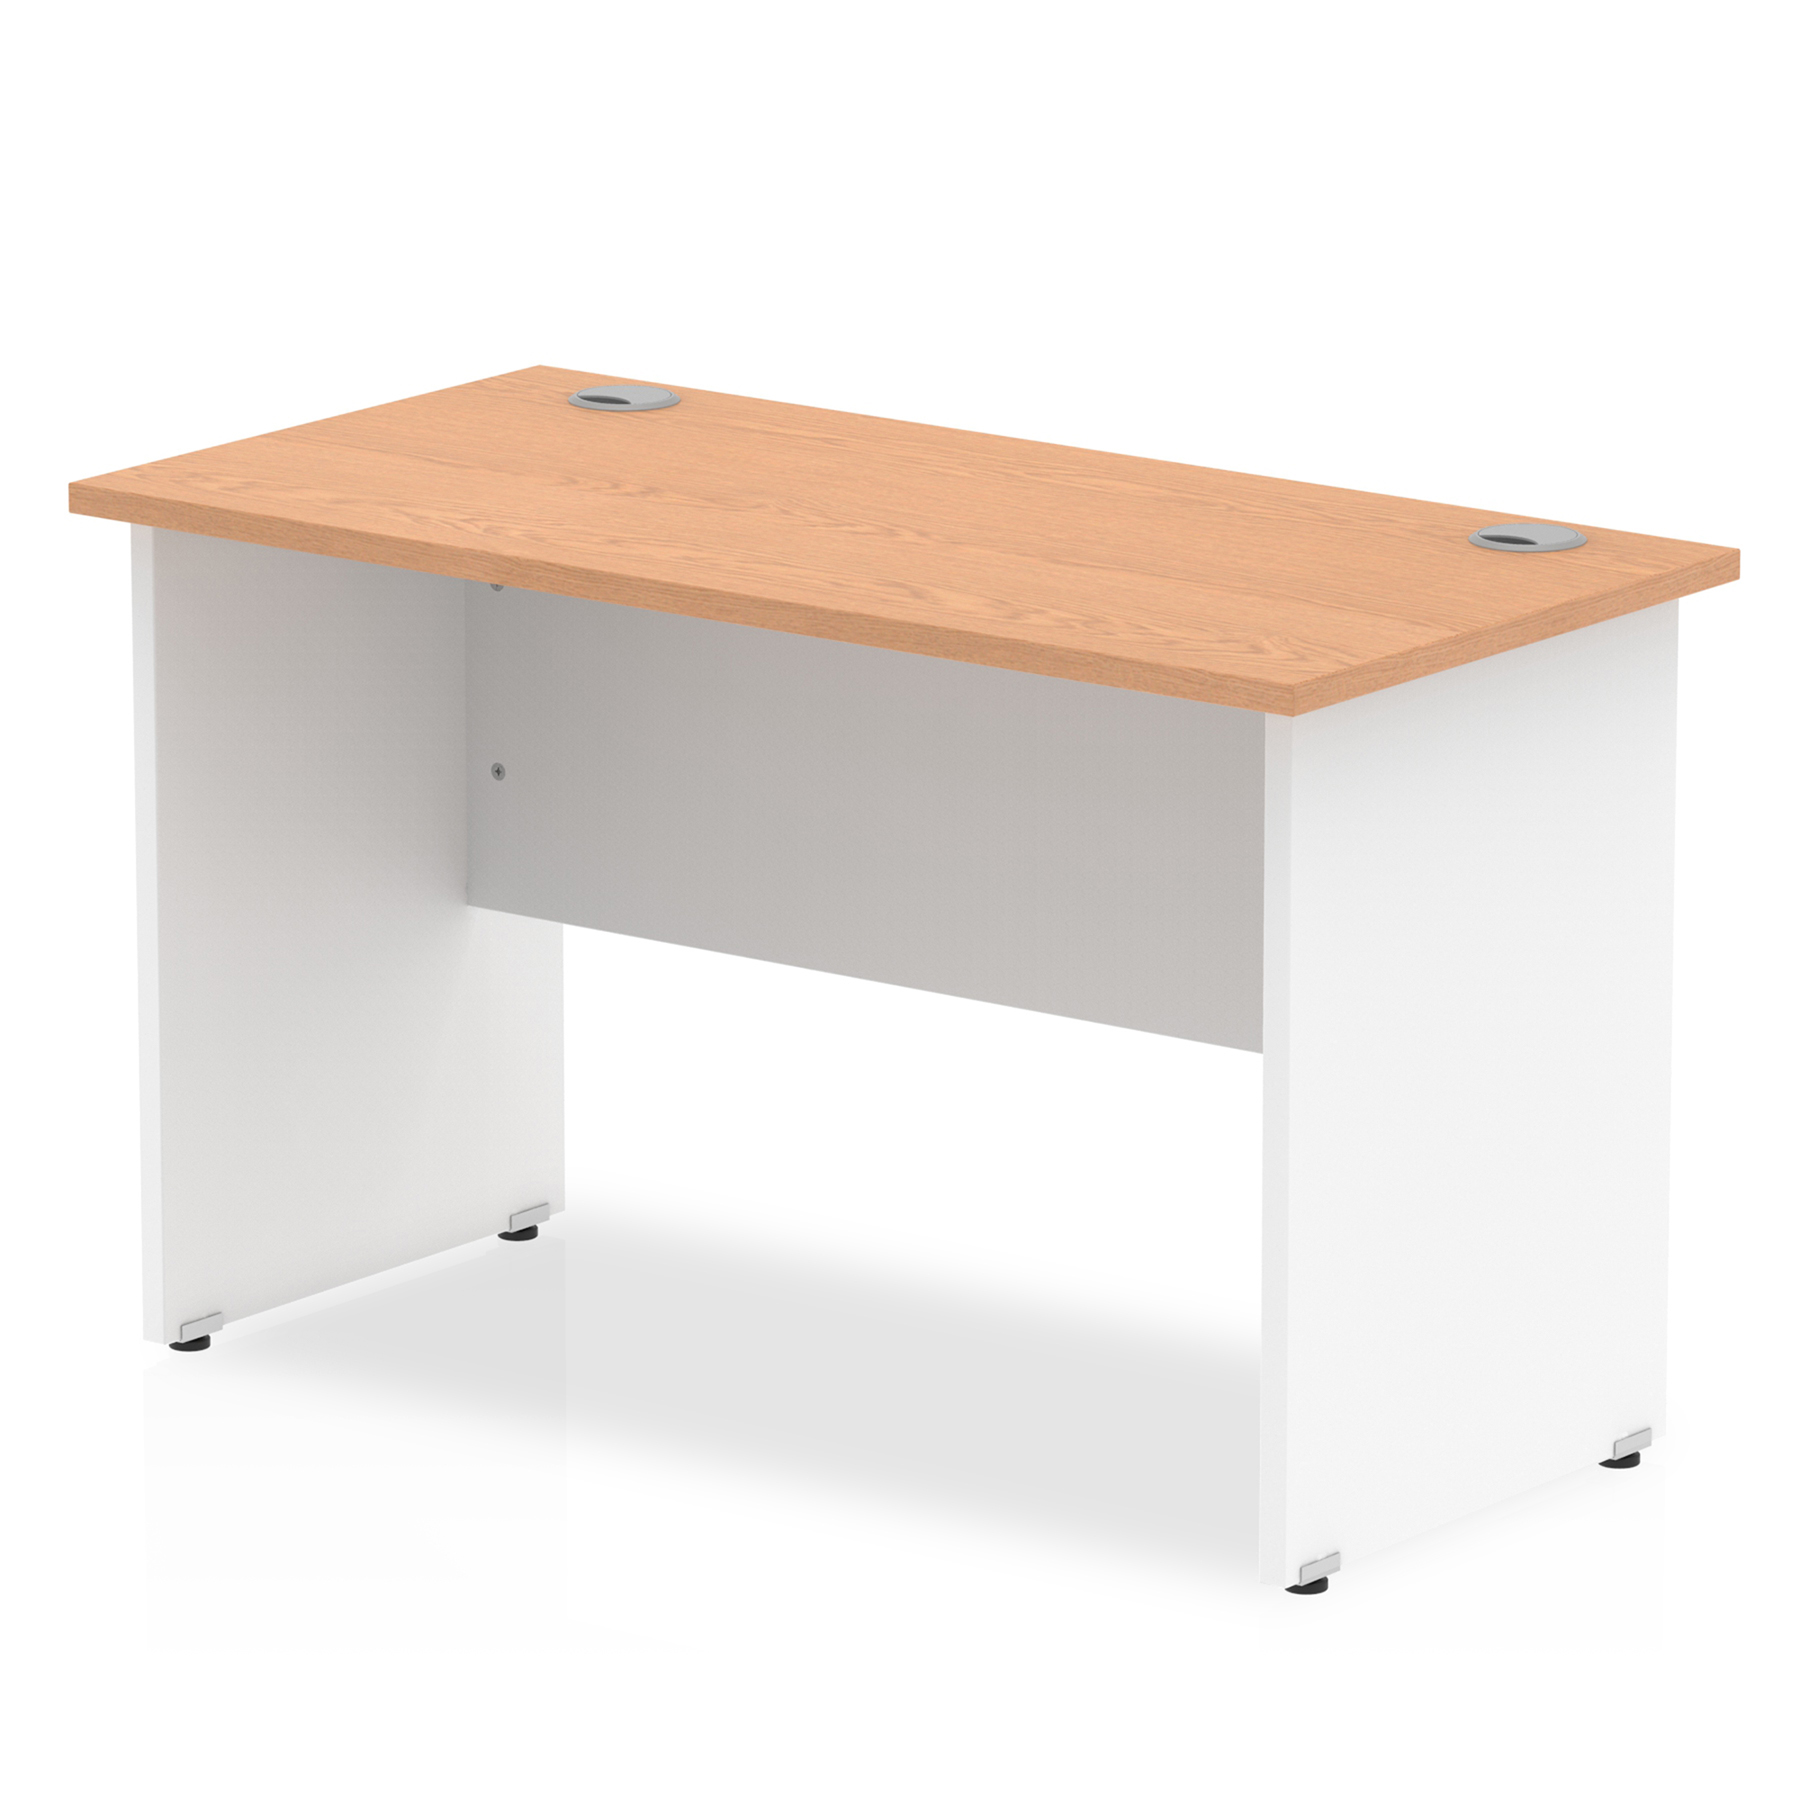 Trexus Desk Rectangle Panel End 800x600mm Oak Top White Panels Ref TT000077